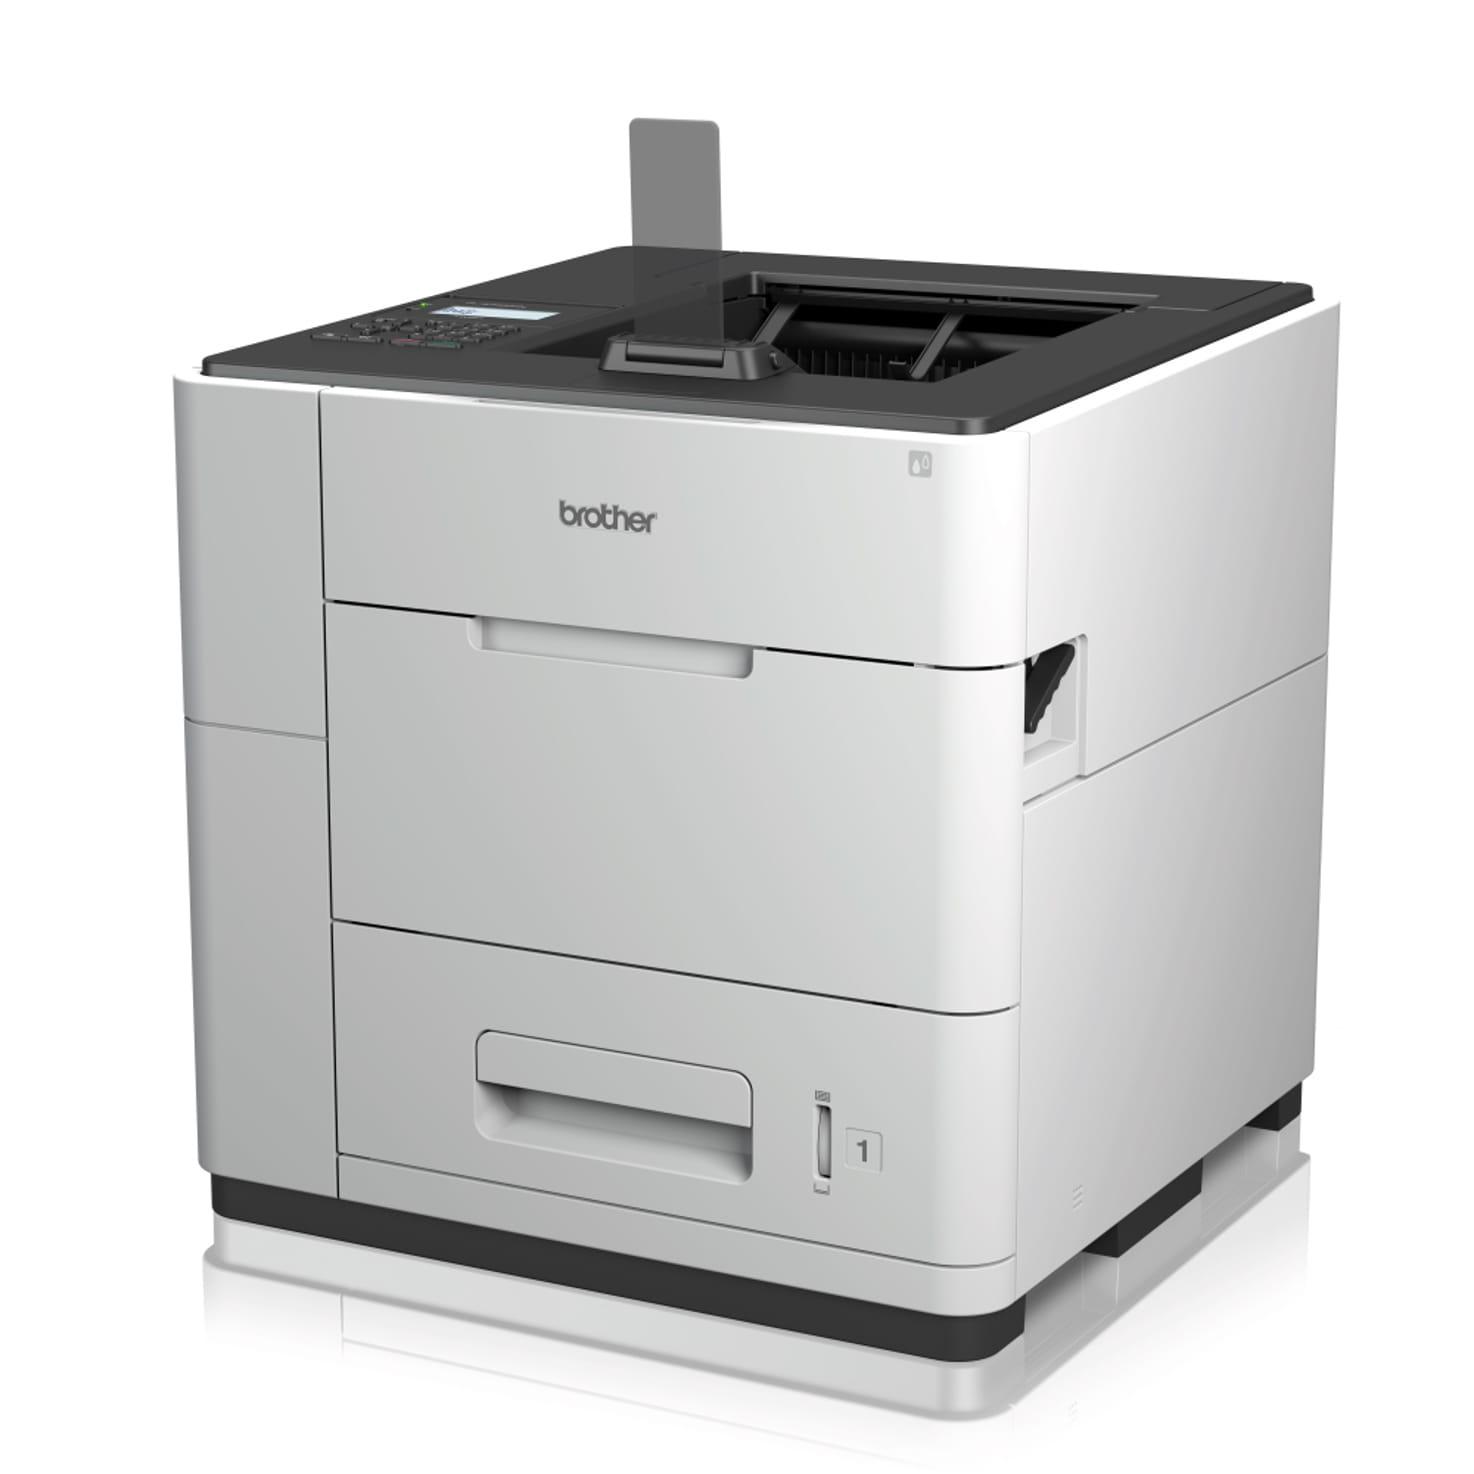 Impressora gran volumen de impressão HL-S7000DN